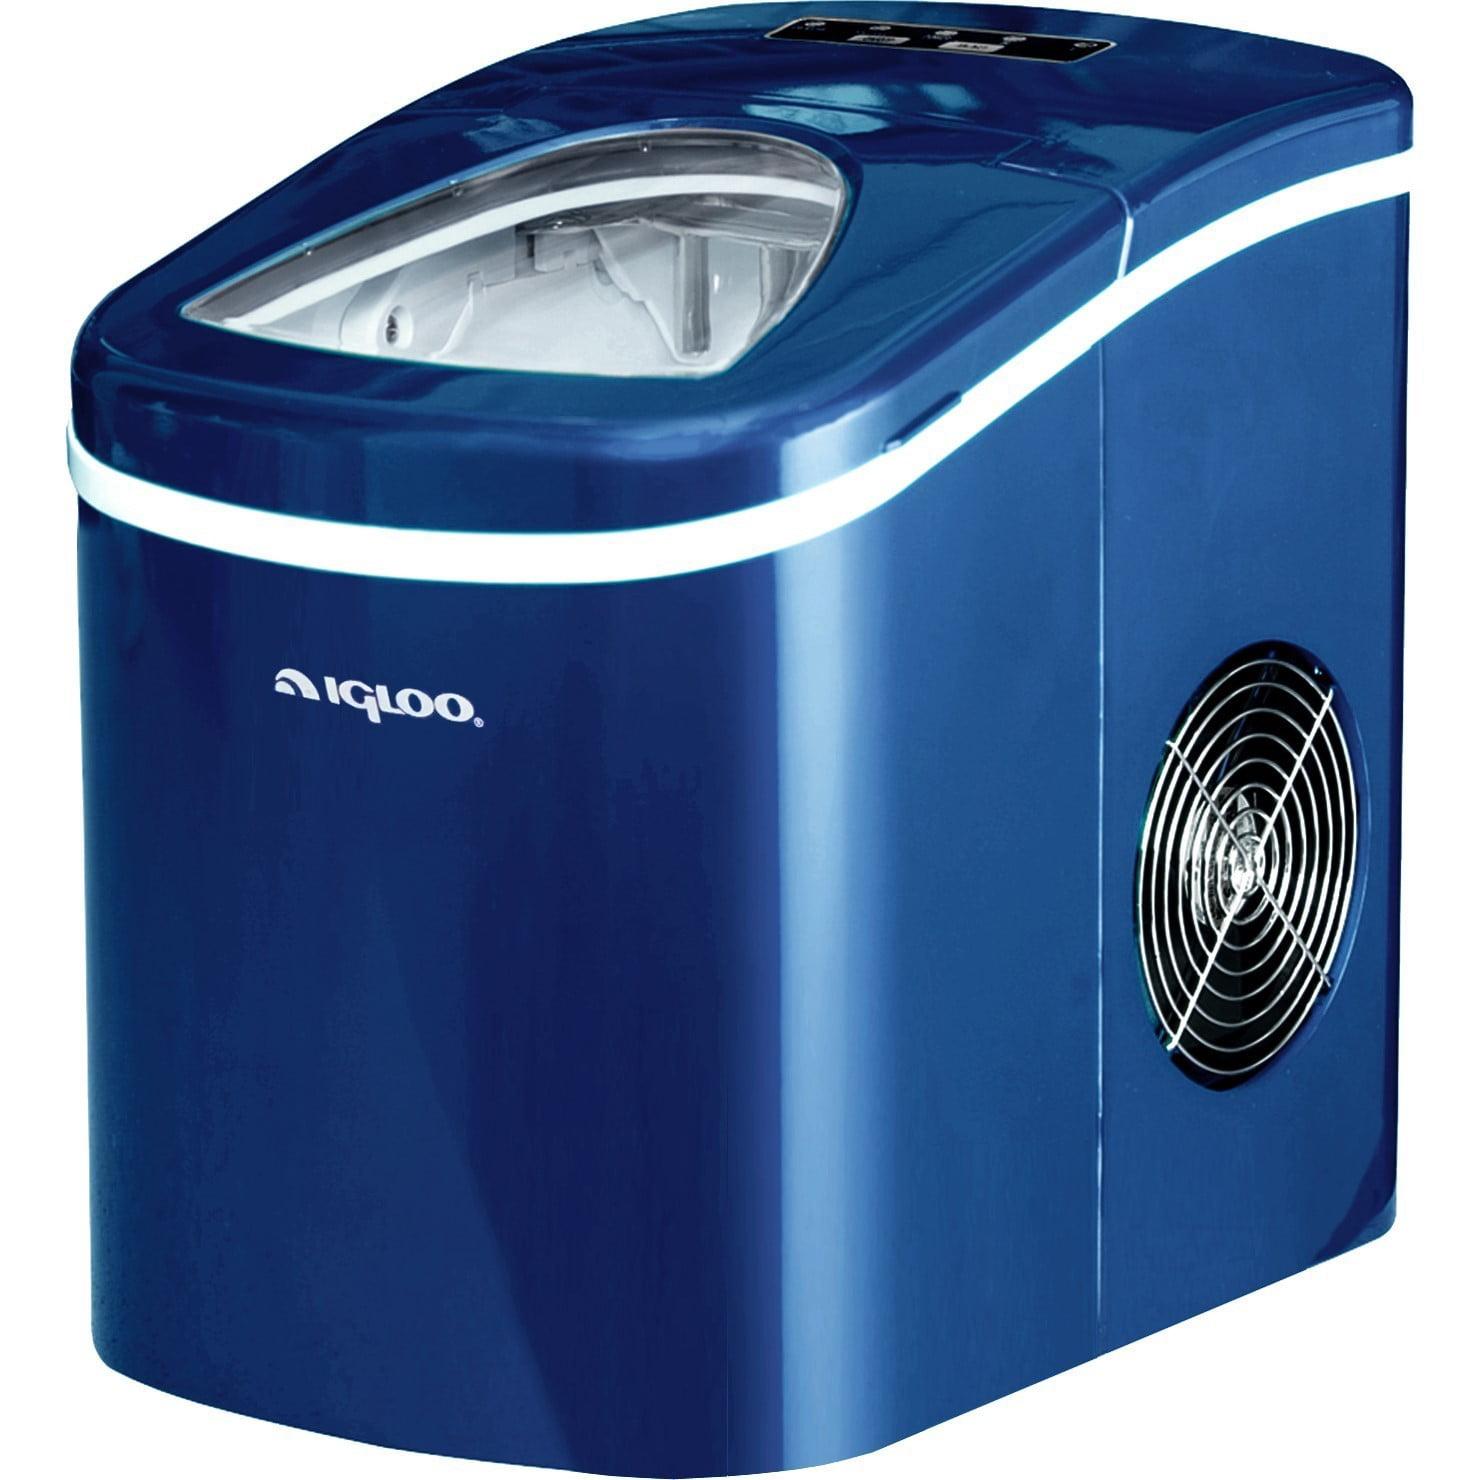 Igloo Portable Countertop Ice Maker 26 Lb Daily Capacity Blue Walmart Com Walmart Com